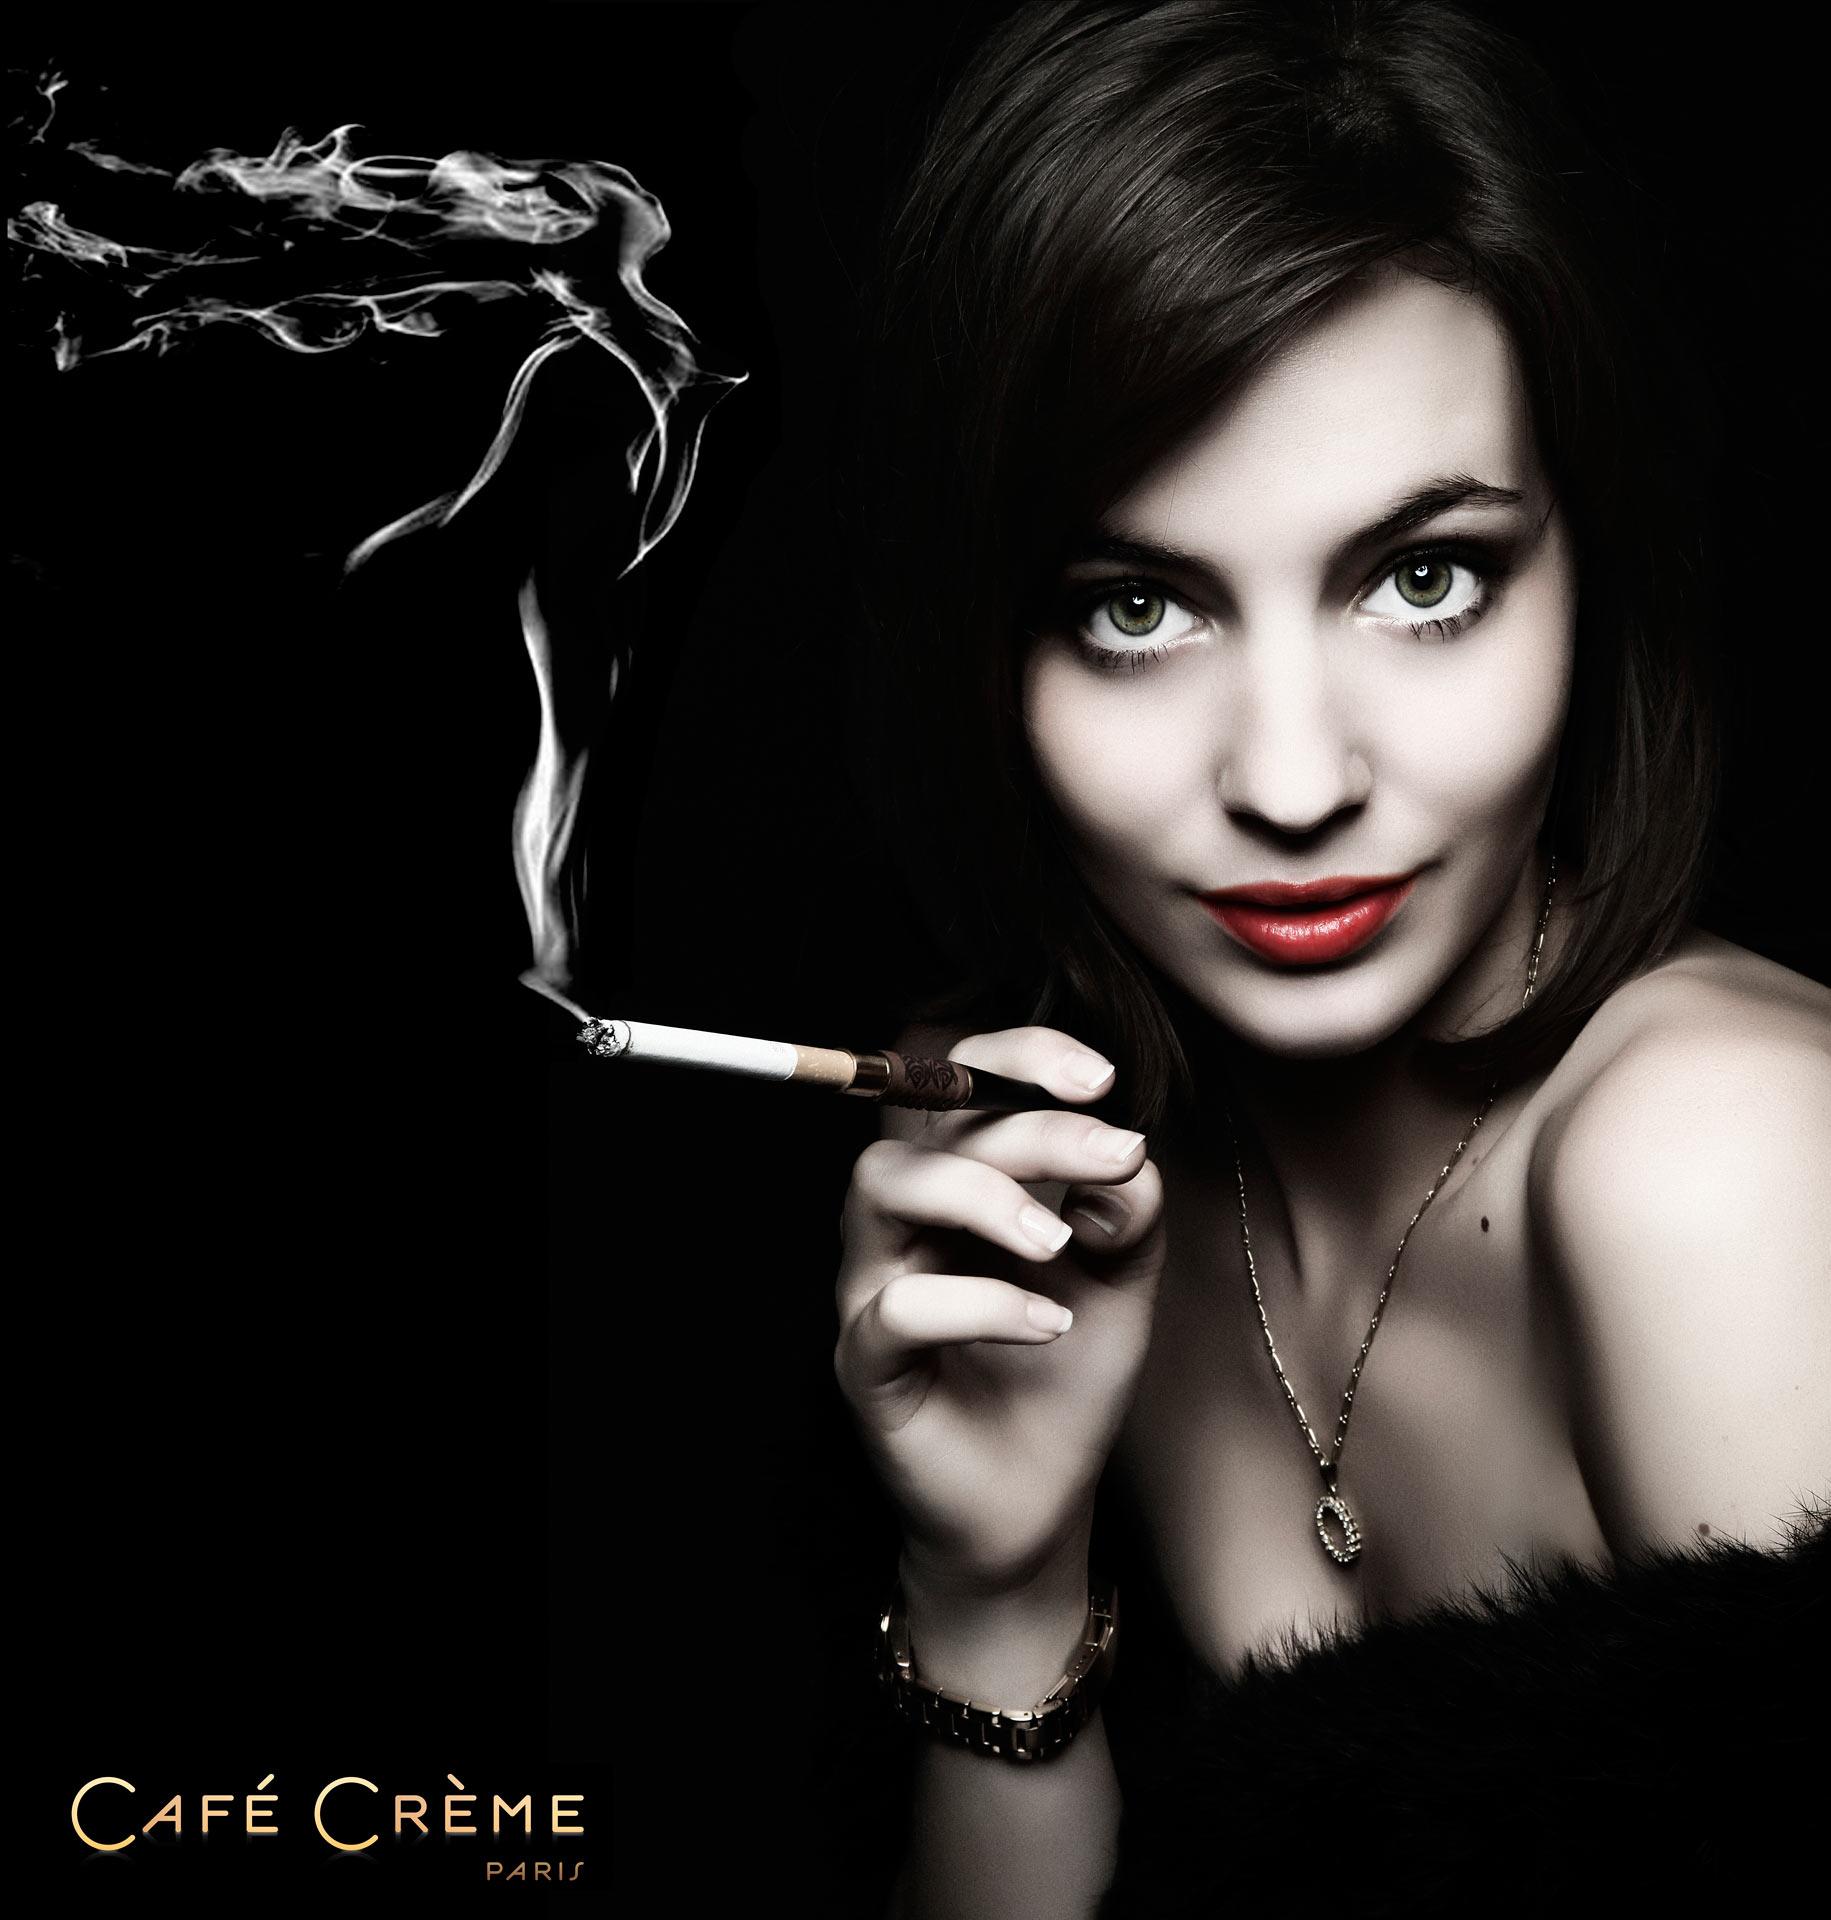 Cafe Creme Paris Menu